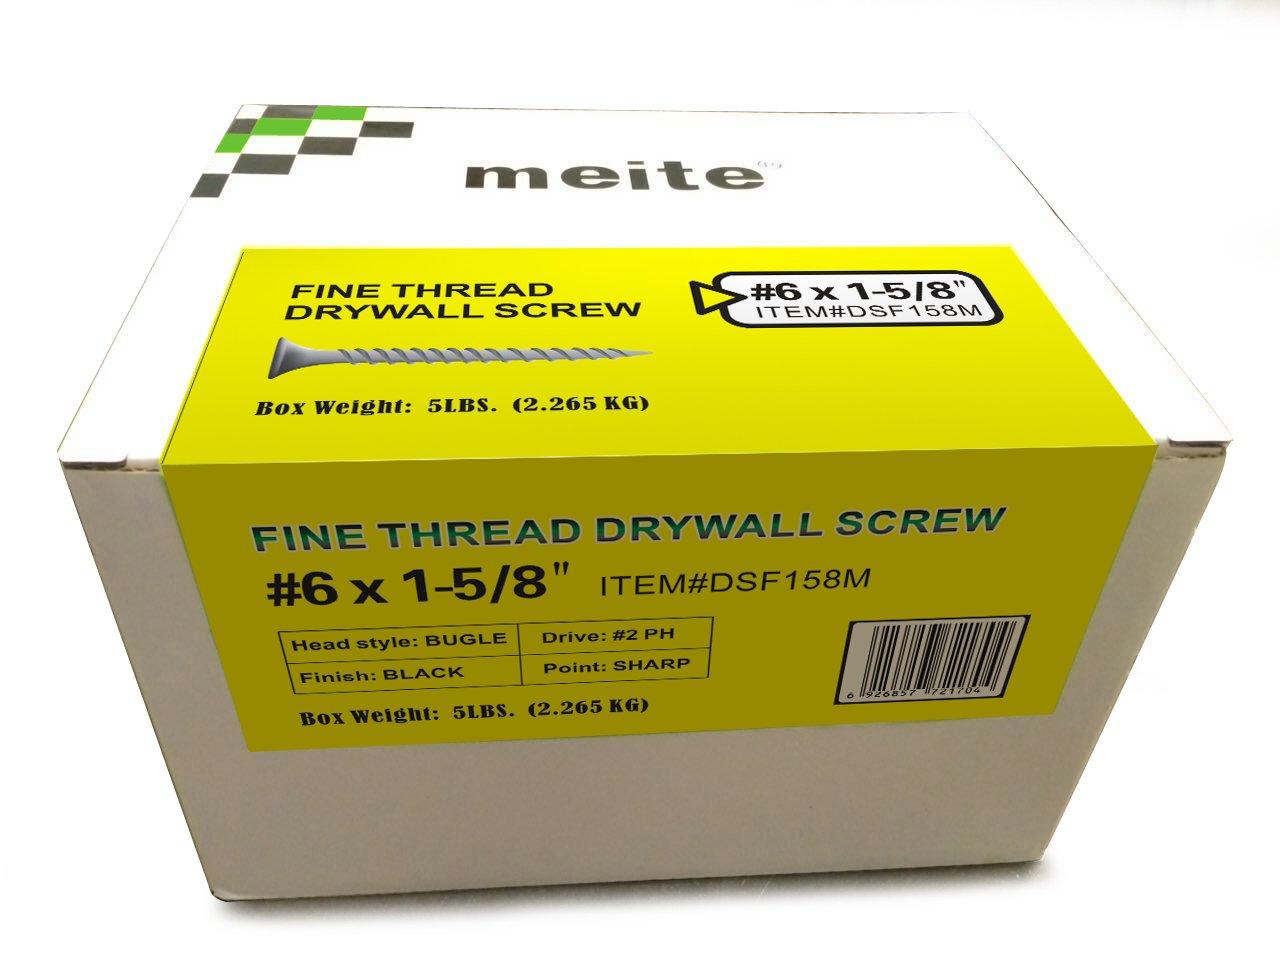 2 Drive Size Gray Phosphate Fine Thread Sharp Point 300-Pcs approximately 1 Pound ,Phillips Bugle Head Fullerkreg #6-18 x 1 Drywall Screw,